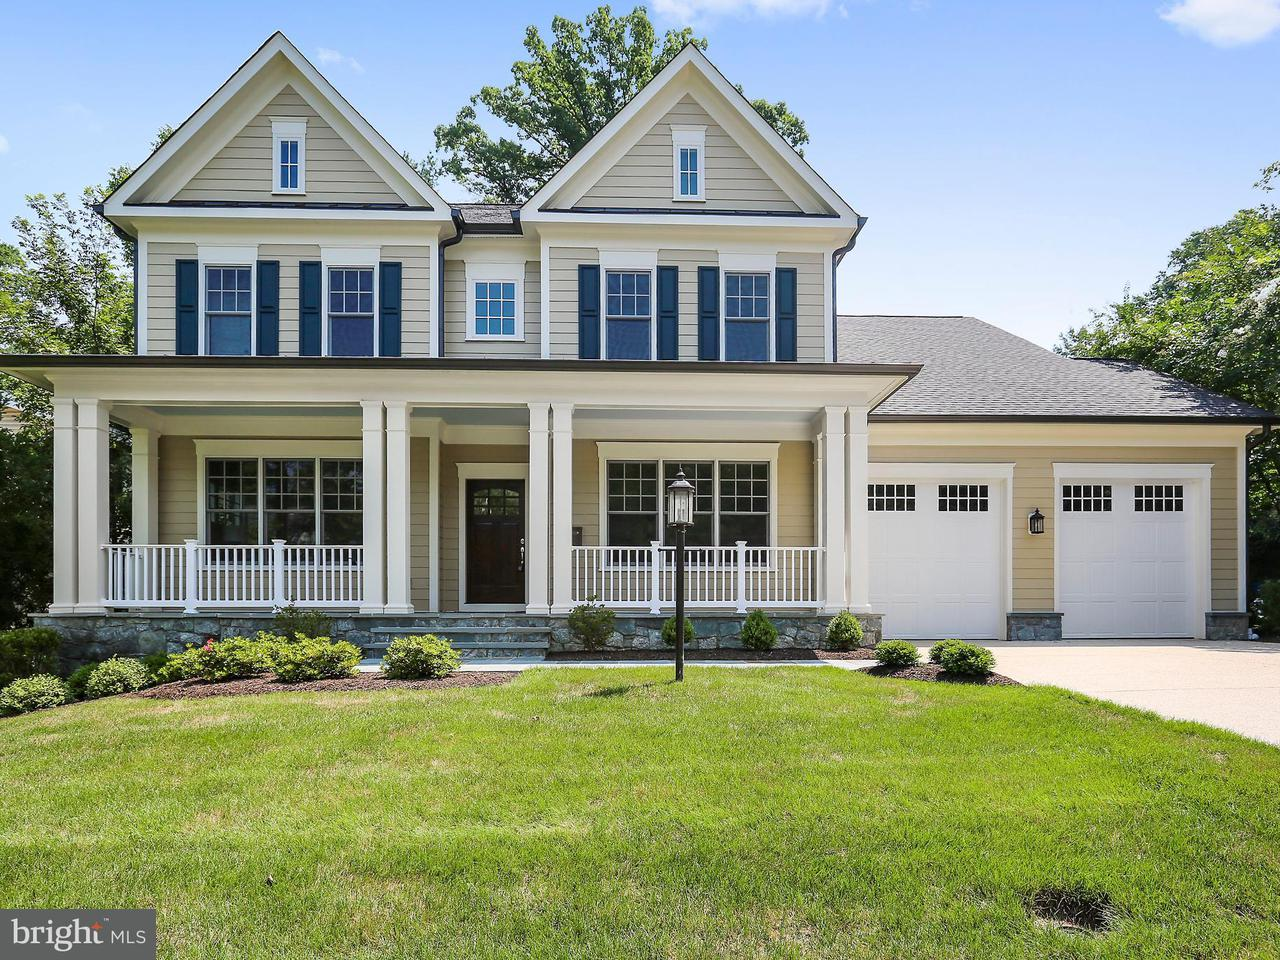 Single Family Home for Sale at 5107 Waukesha Road 5107 Waukesha Road Bethesda, Maryland 20816 United States